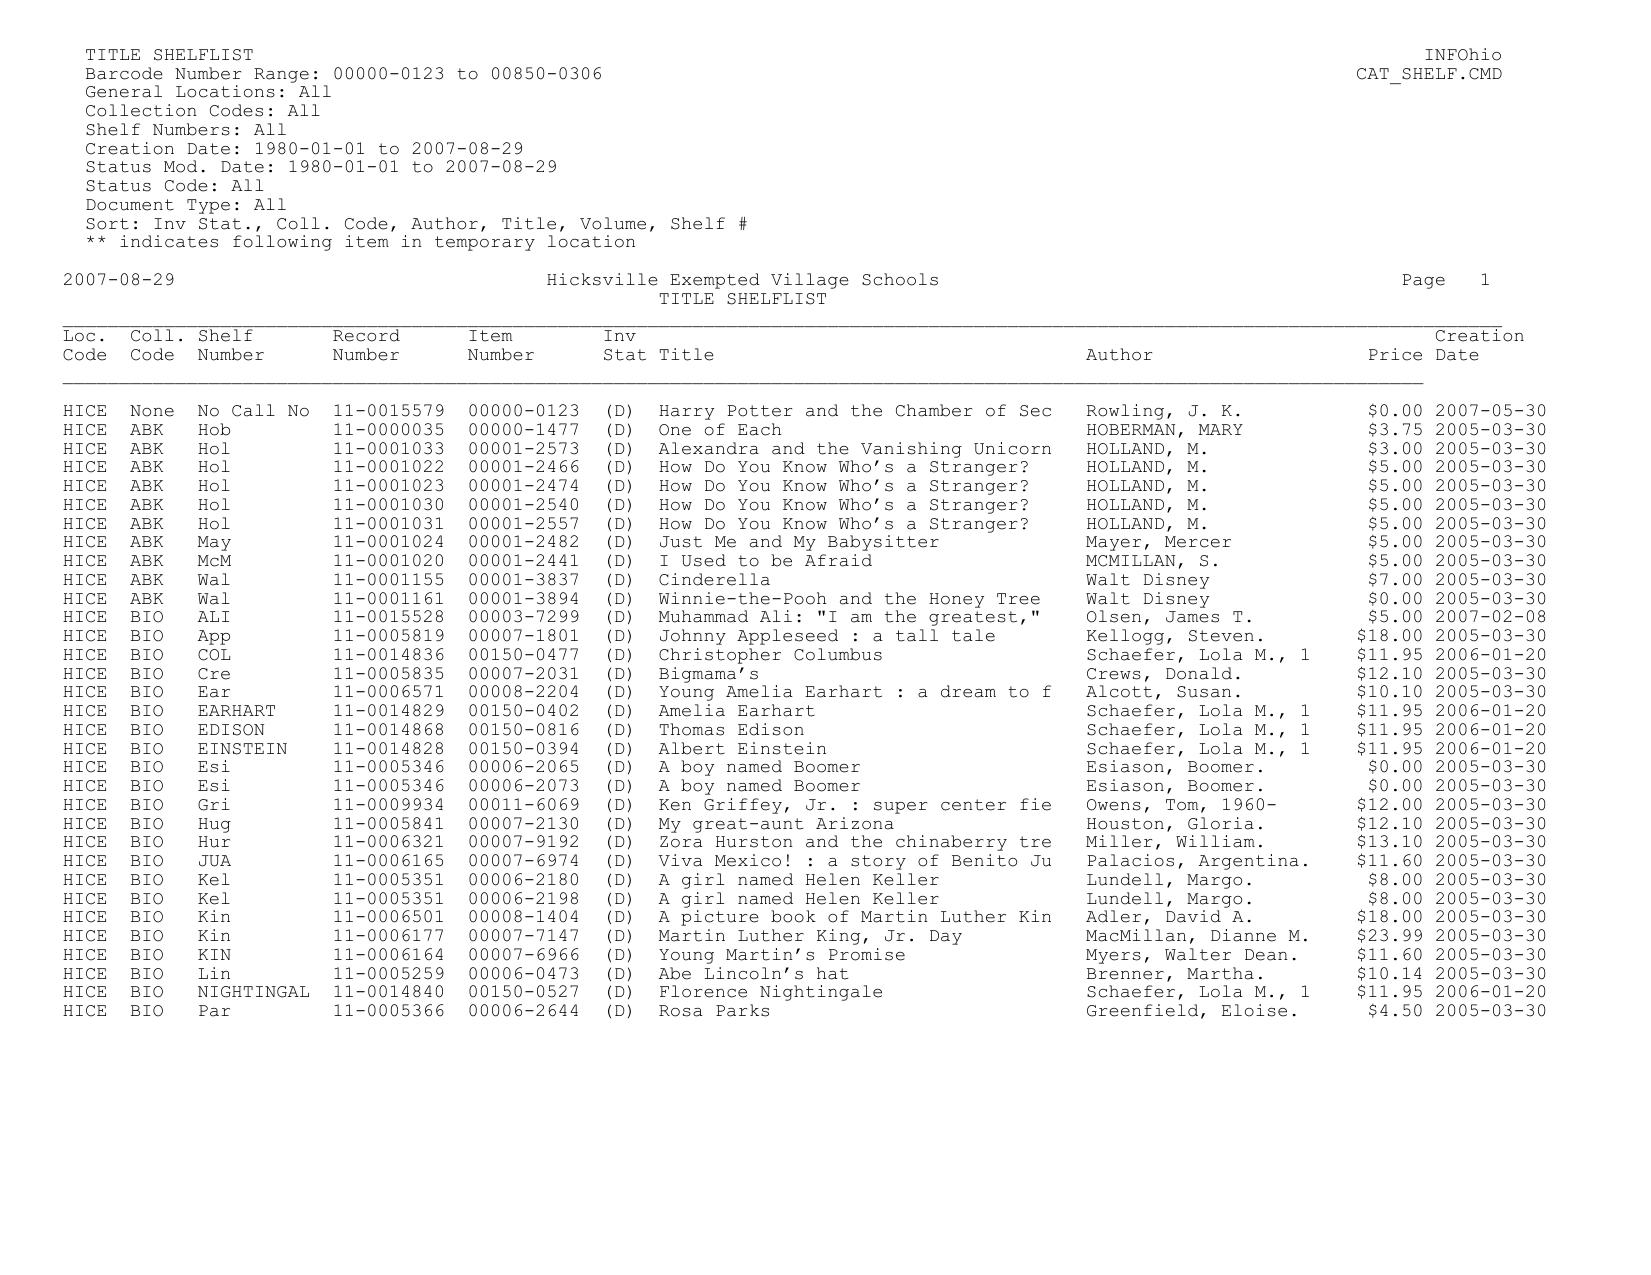 1d531da346e7 TITLE SHELFLIST INFOhio Barcode Number Range